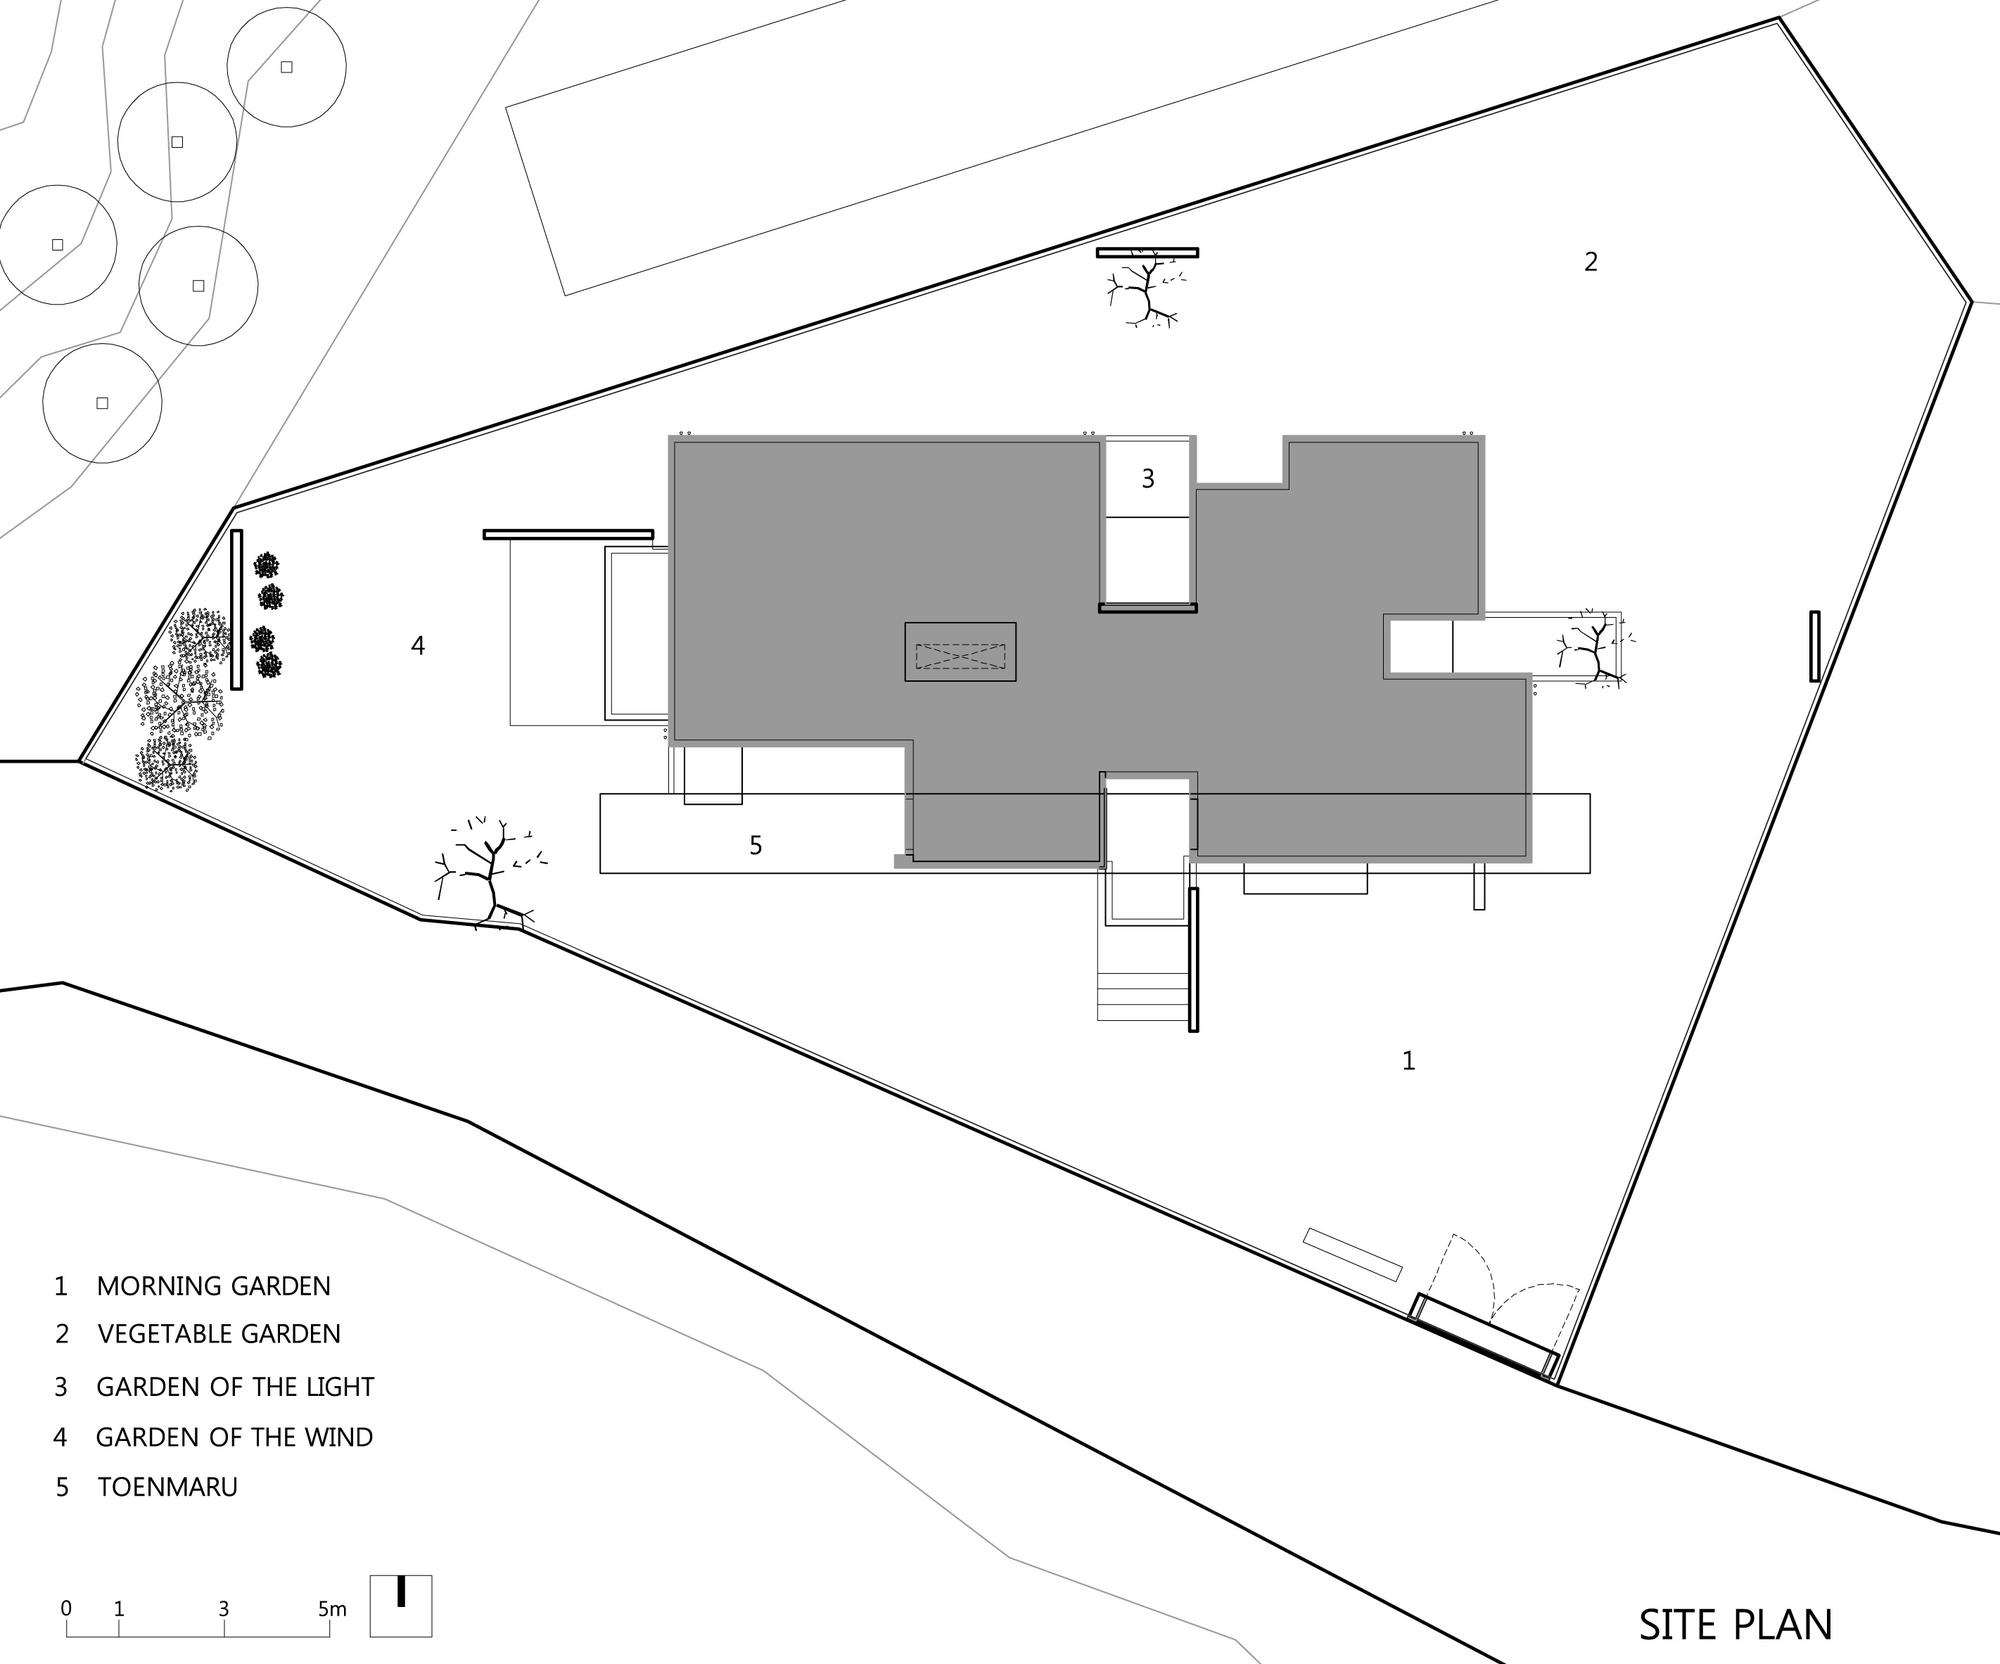 52f1a64ee8e44e61110000c6_mun-jeong-heon-a-m-architects_siteplan